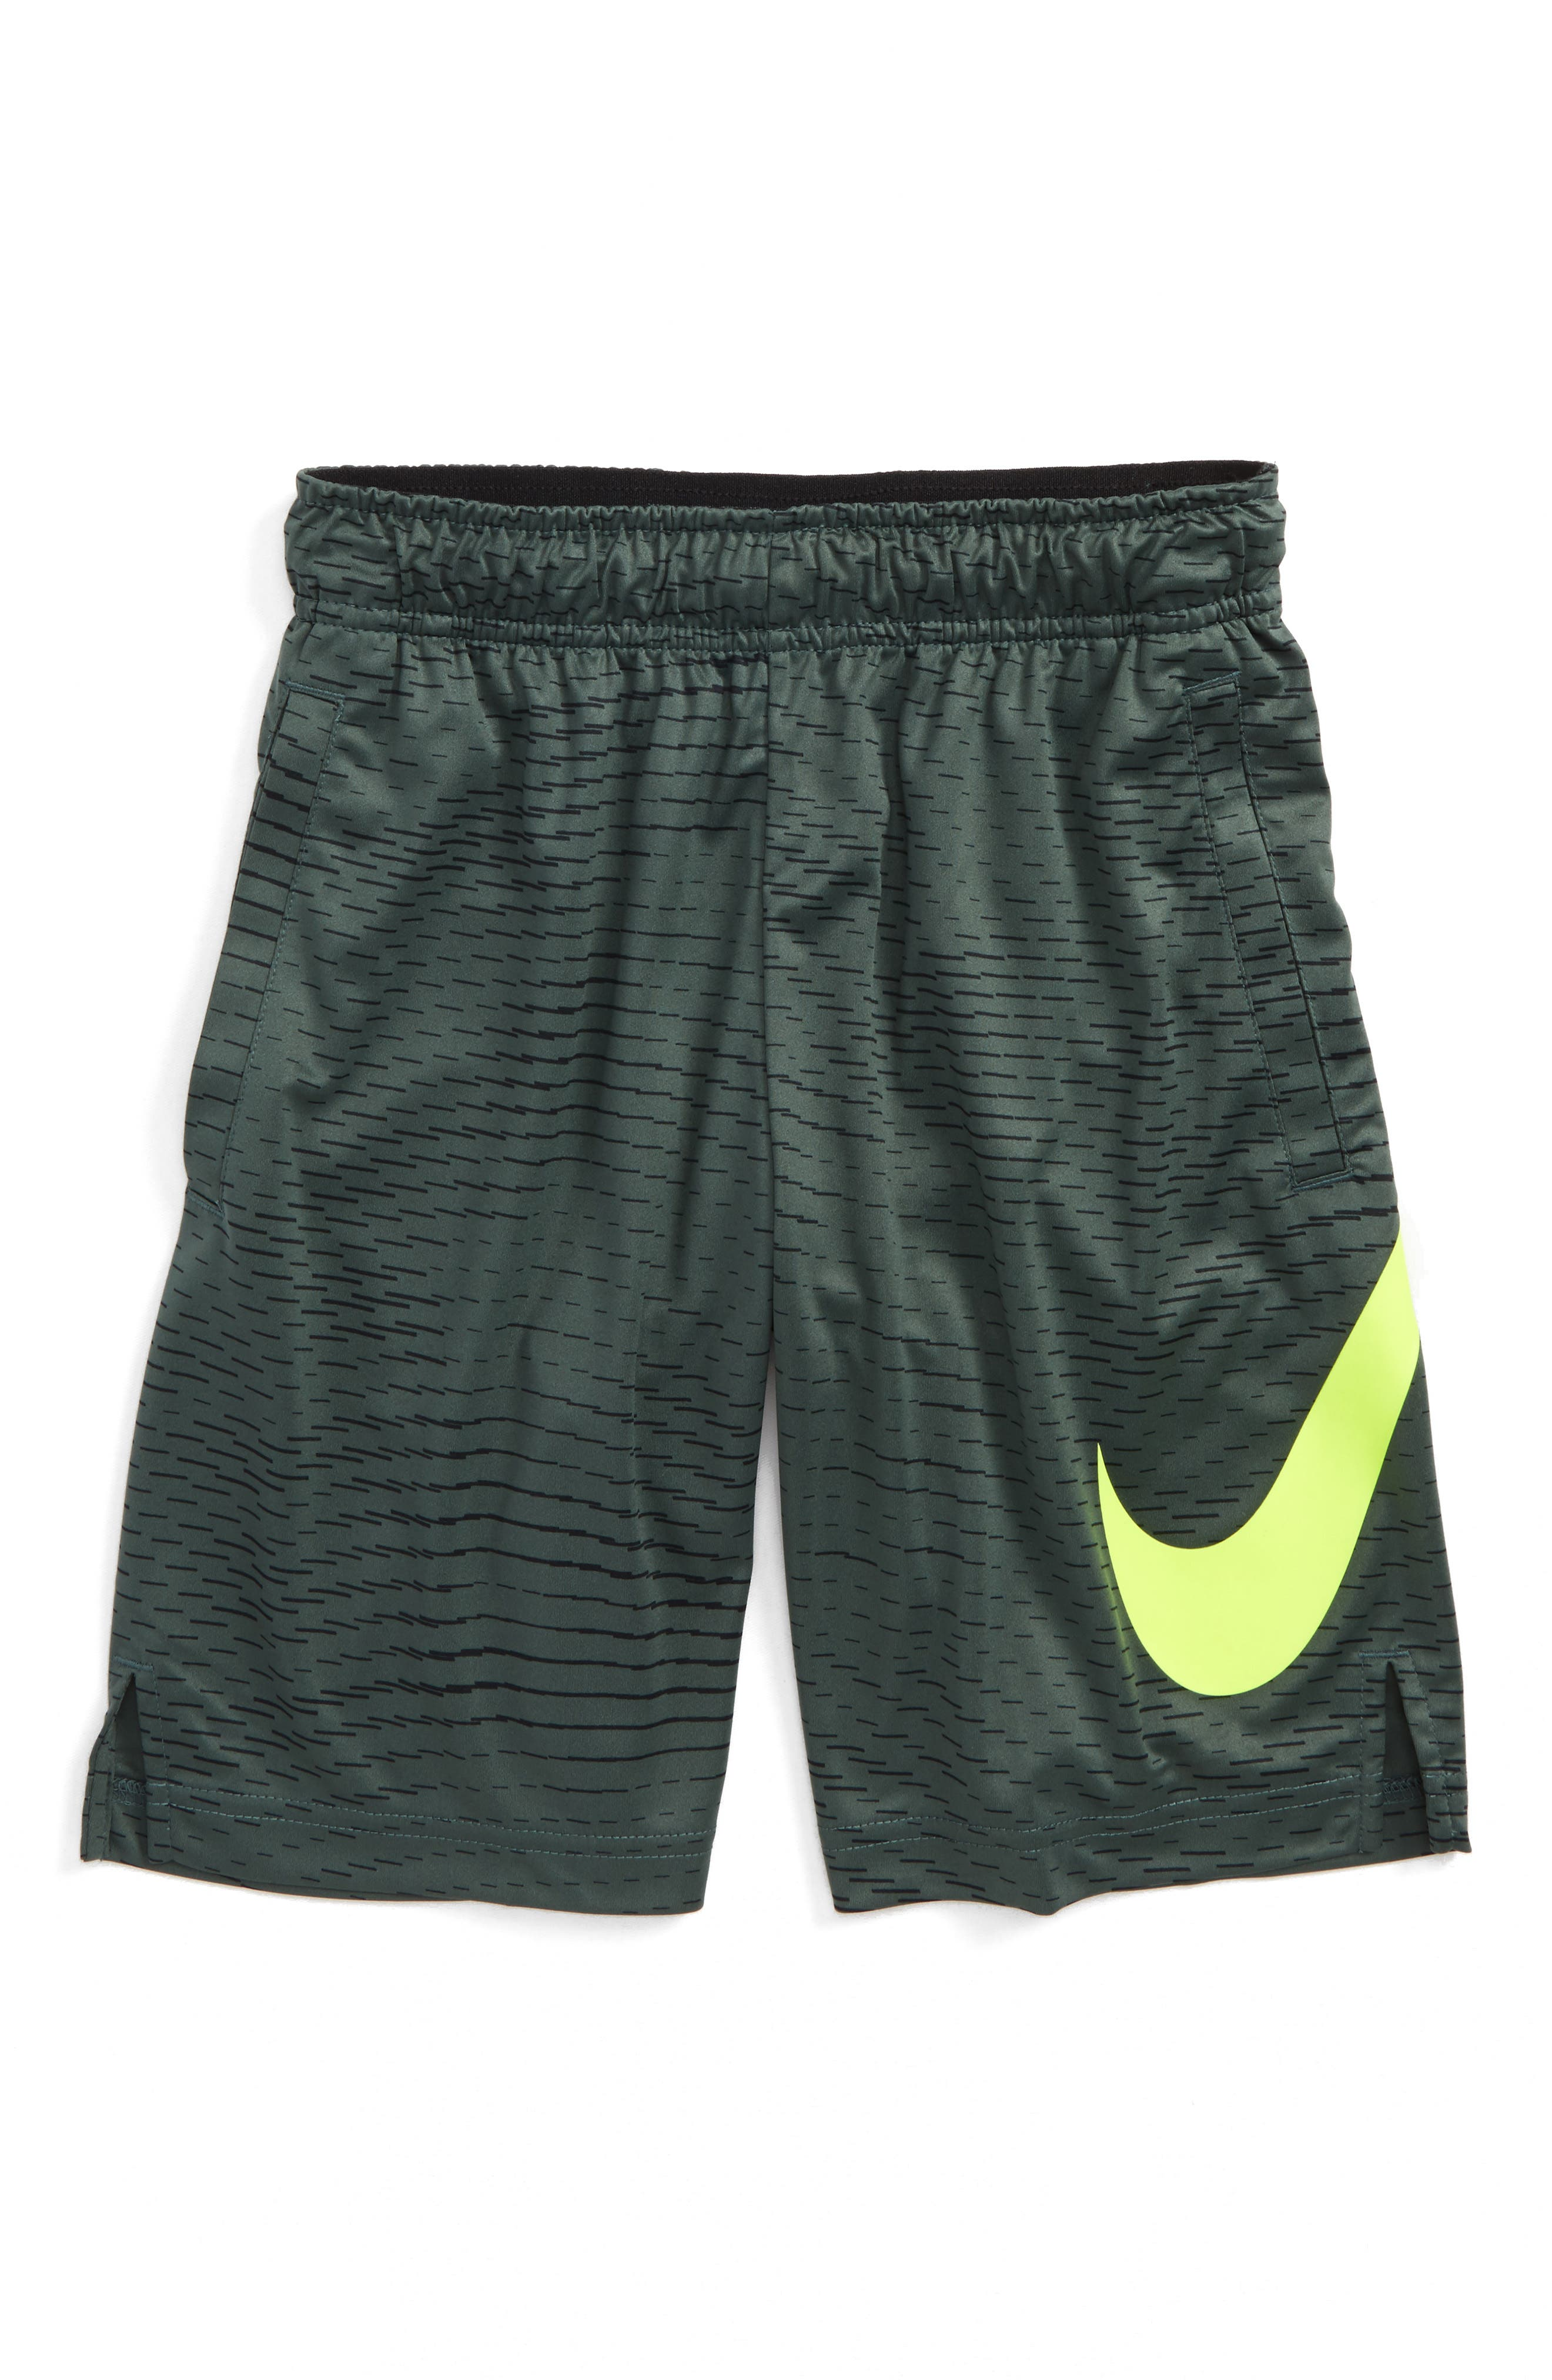 AOP Dry Shorts,                         Main,                         color,